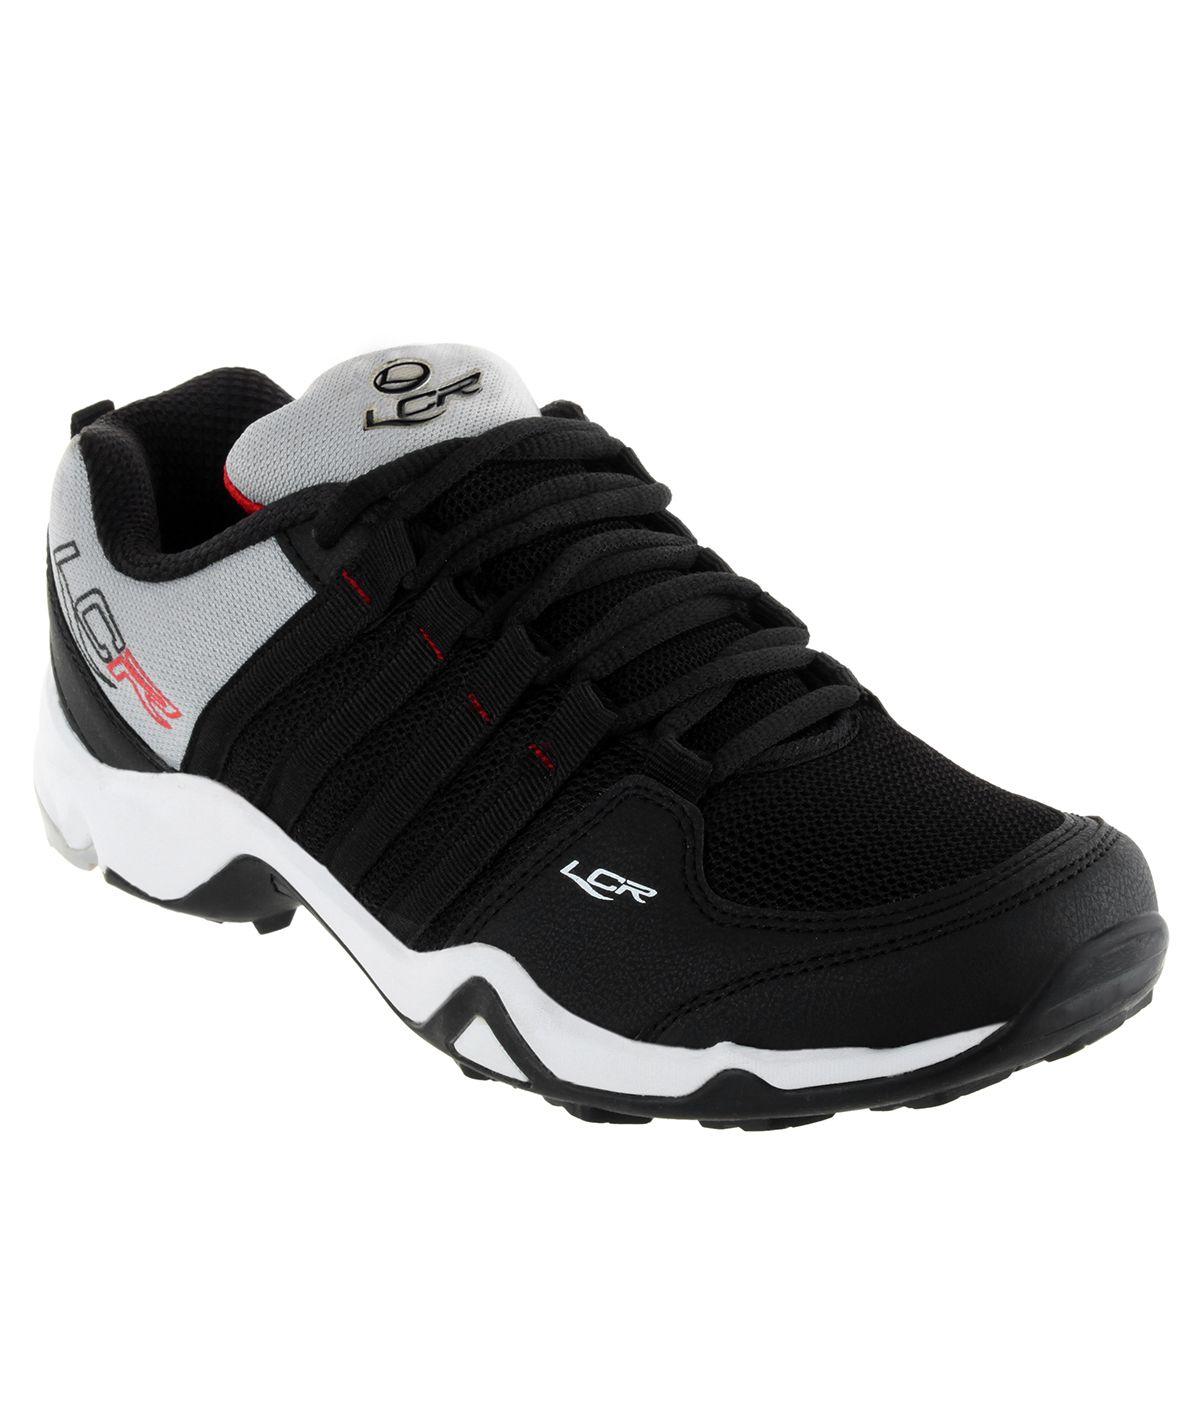 1f96e967653 Lancer cuba-14 Black Running Shoes - Buy Lancer cuba-14 Black ...